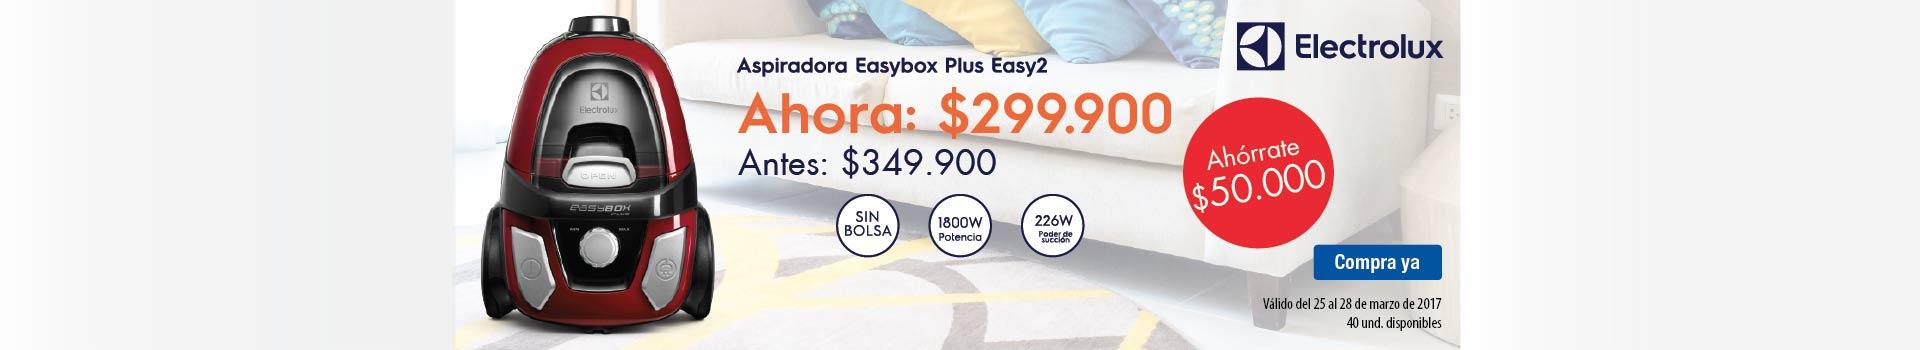 CAT ELECT - marzo 25 - Aspiradora ELECTROLUX EasyBox R 6 Opiniones  Código: 7896347147545